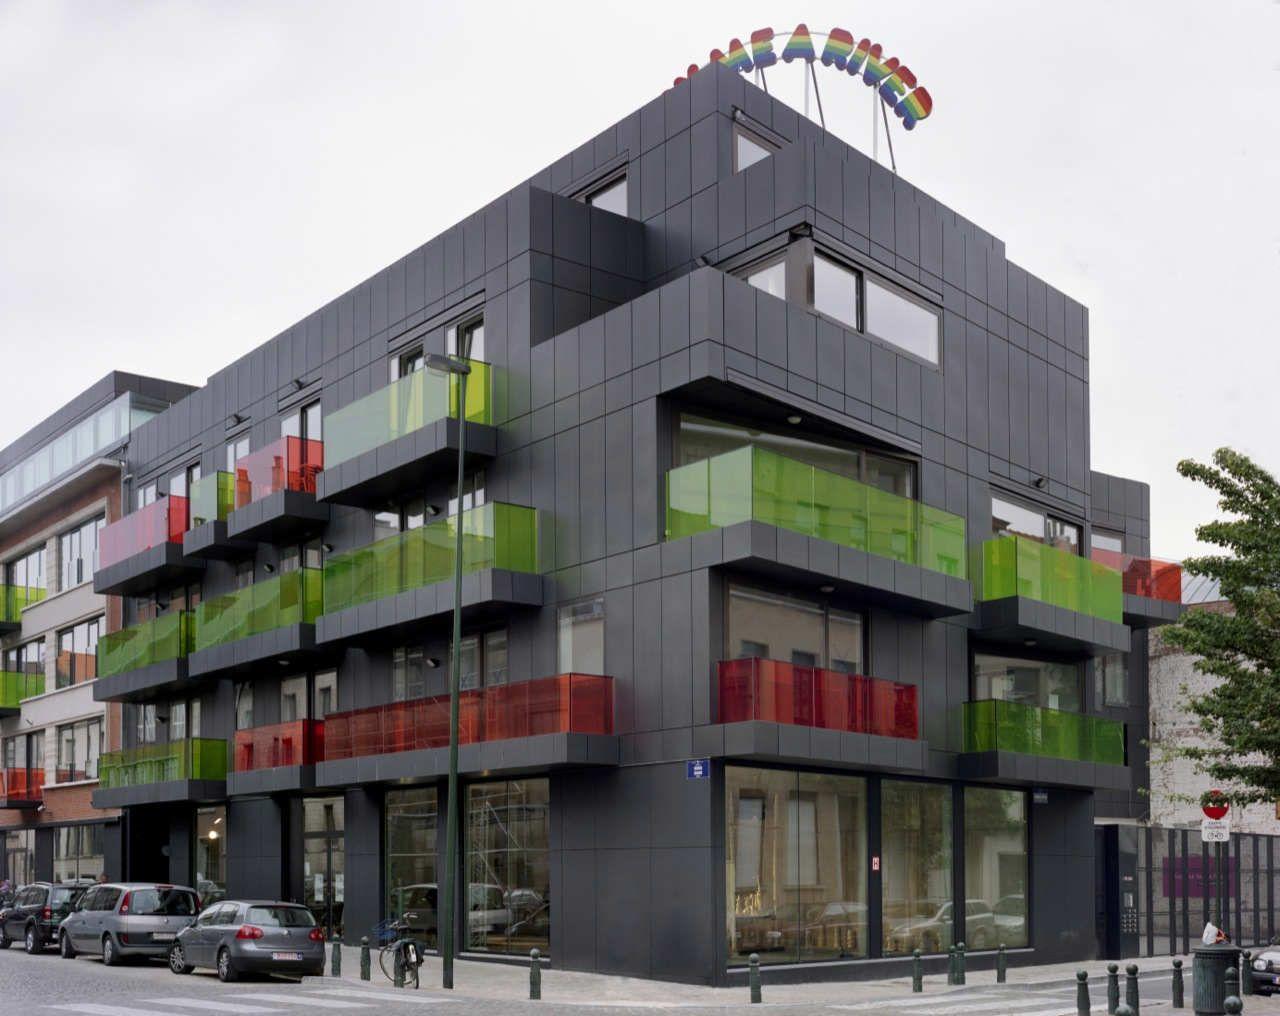 Vanhaerents / Lhoas & Lhoas Architectes